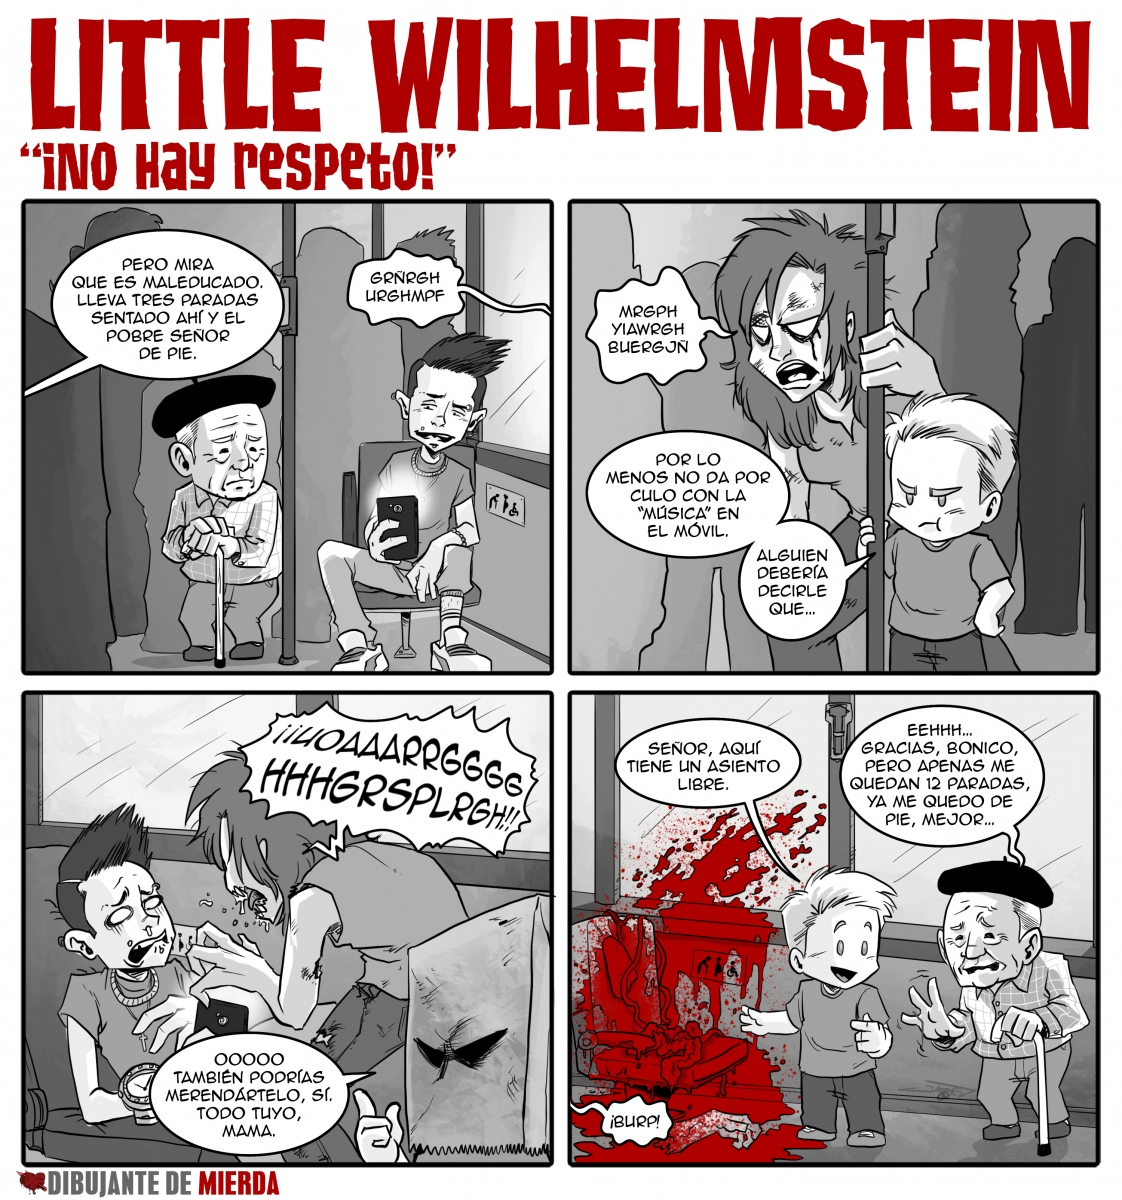 Wilhelmstein-No-hay-respeto